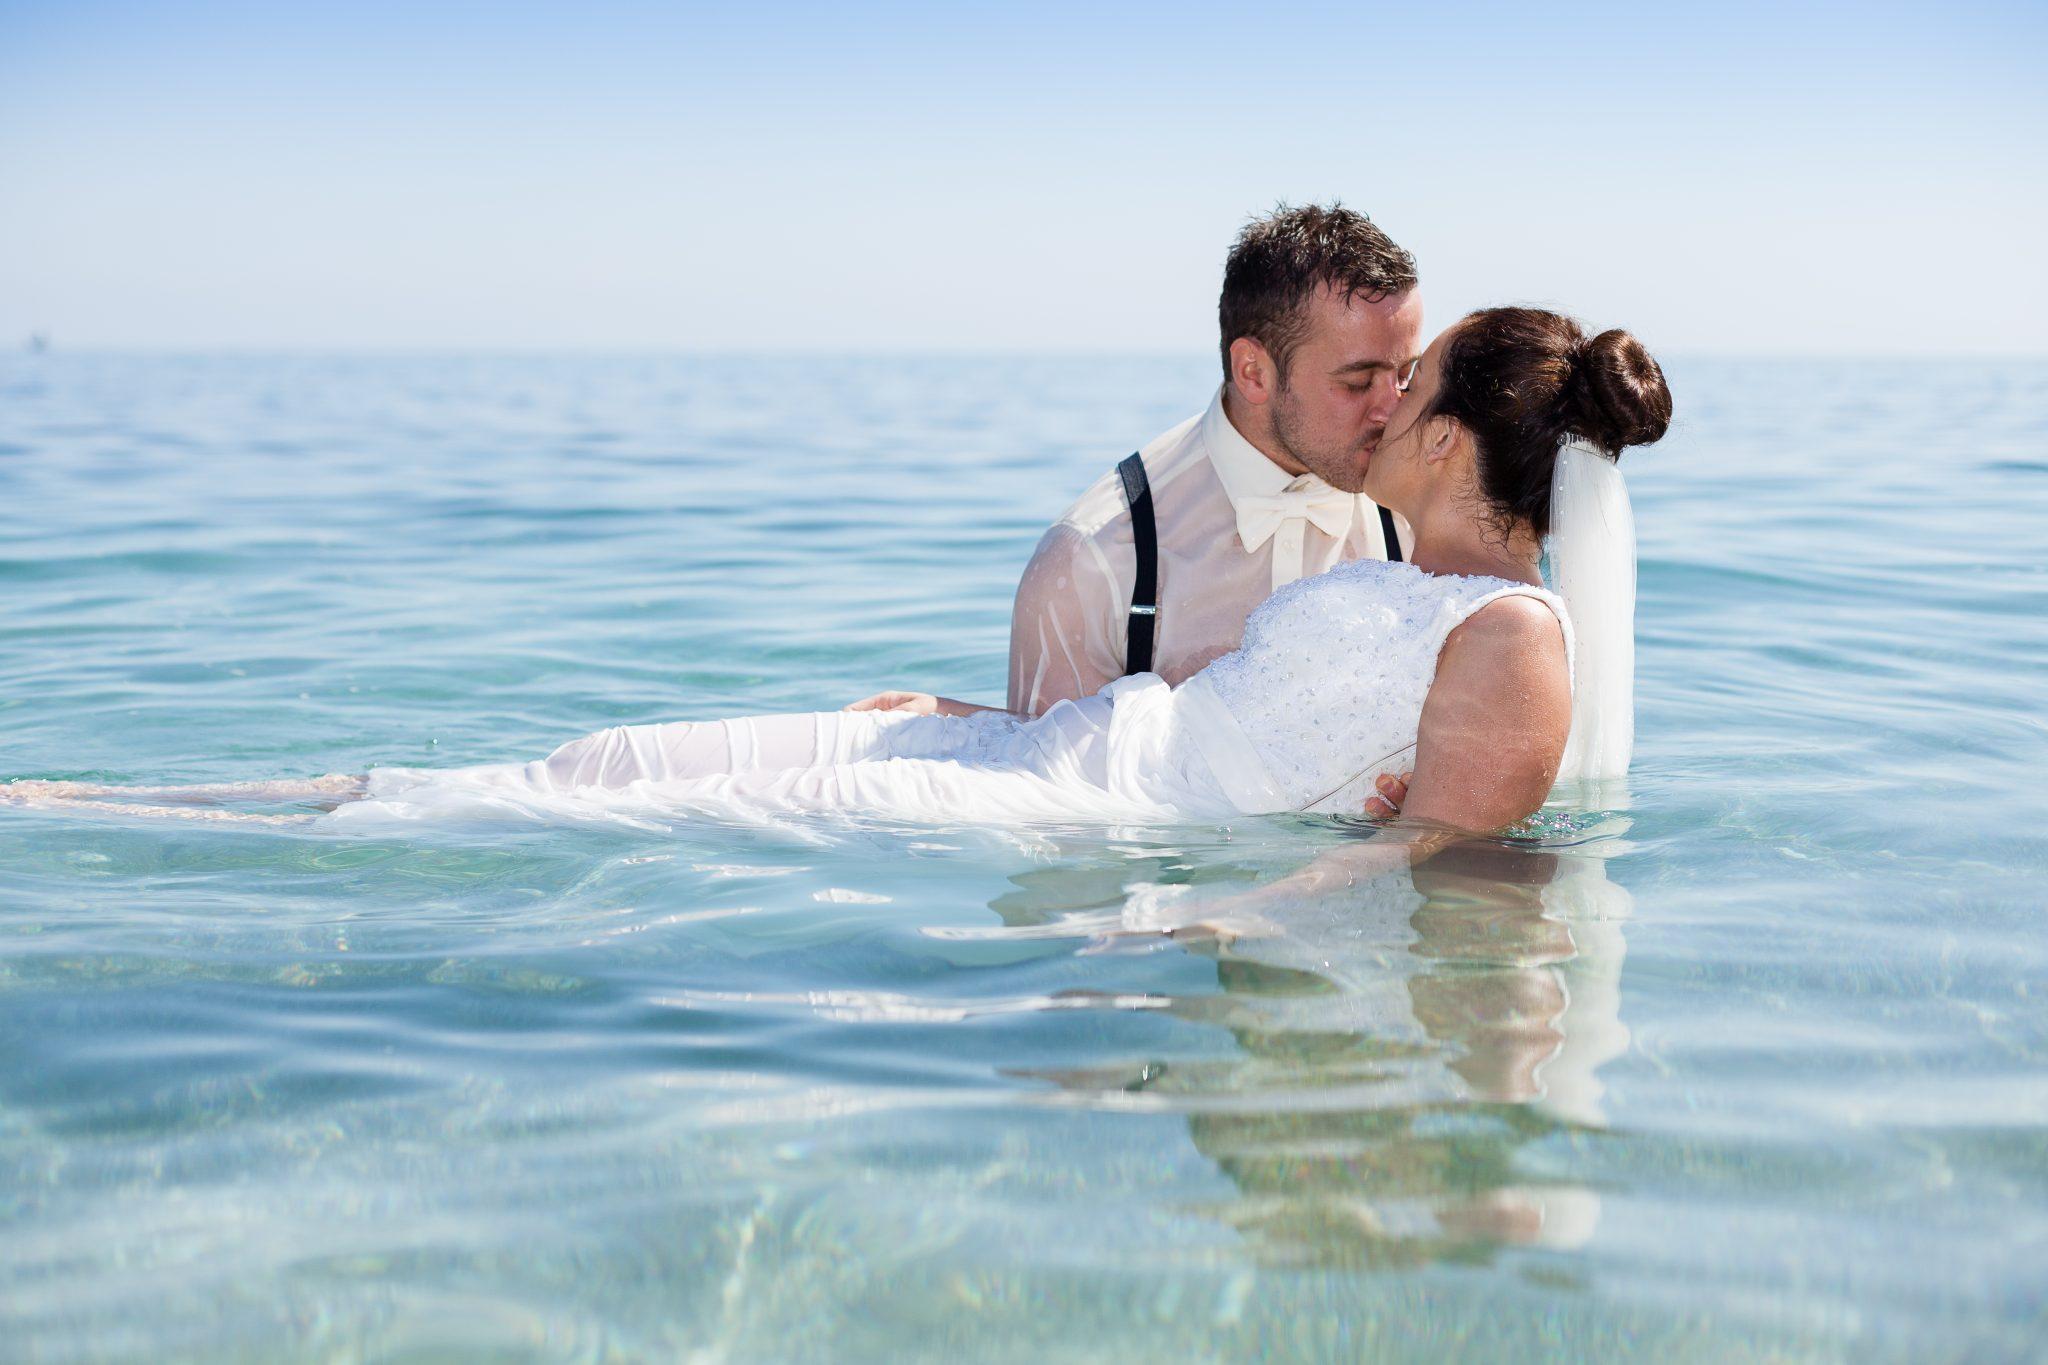 Dougie Farrelly Wedding Photographer Spain Marbella Video Silverscreen